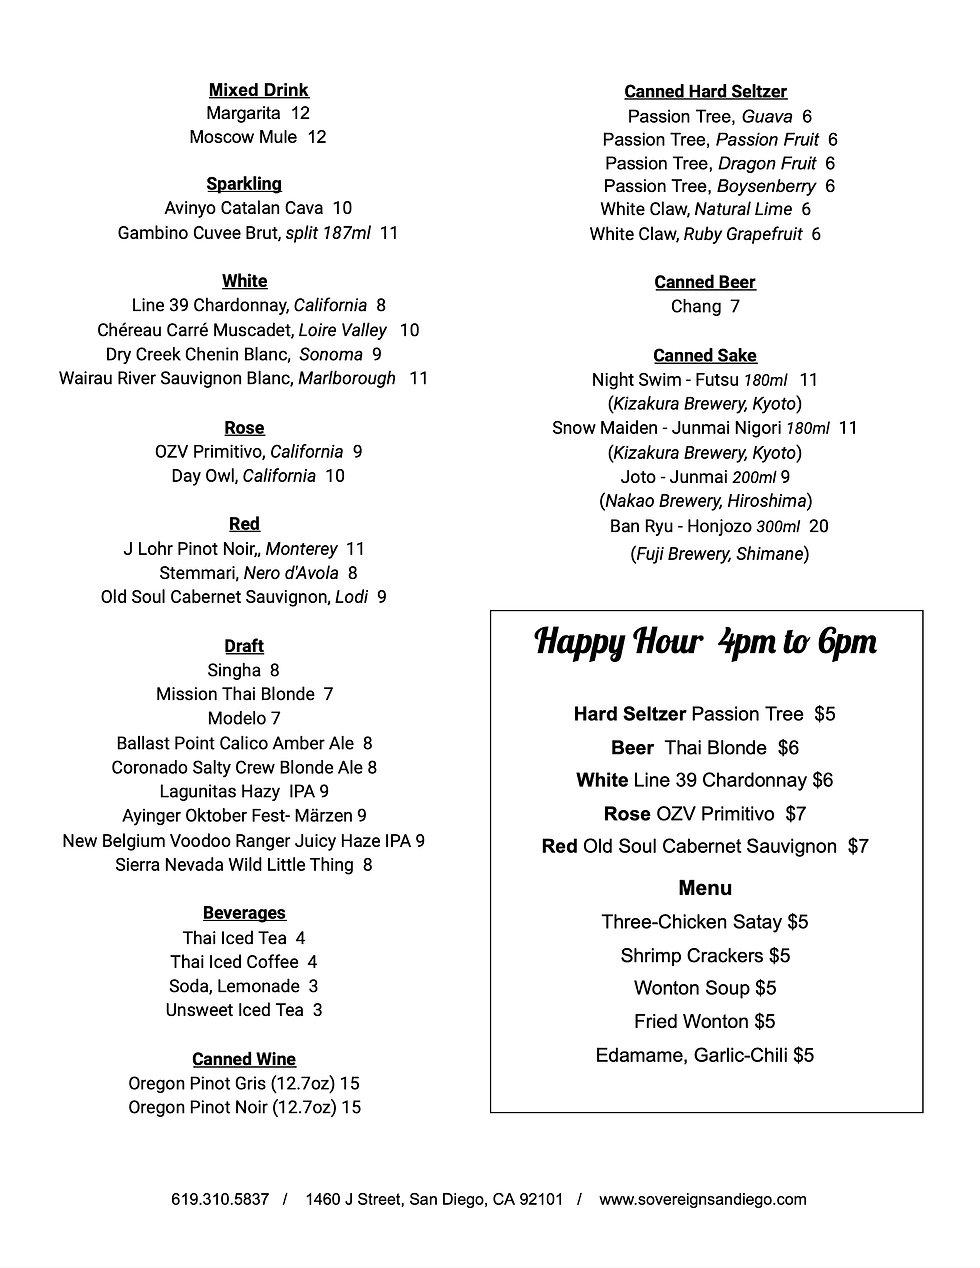 Wine List - Google Docs.jpg